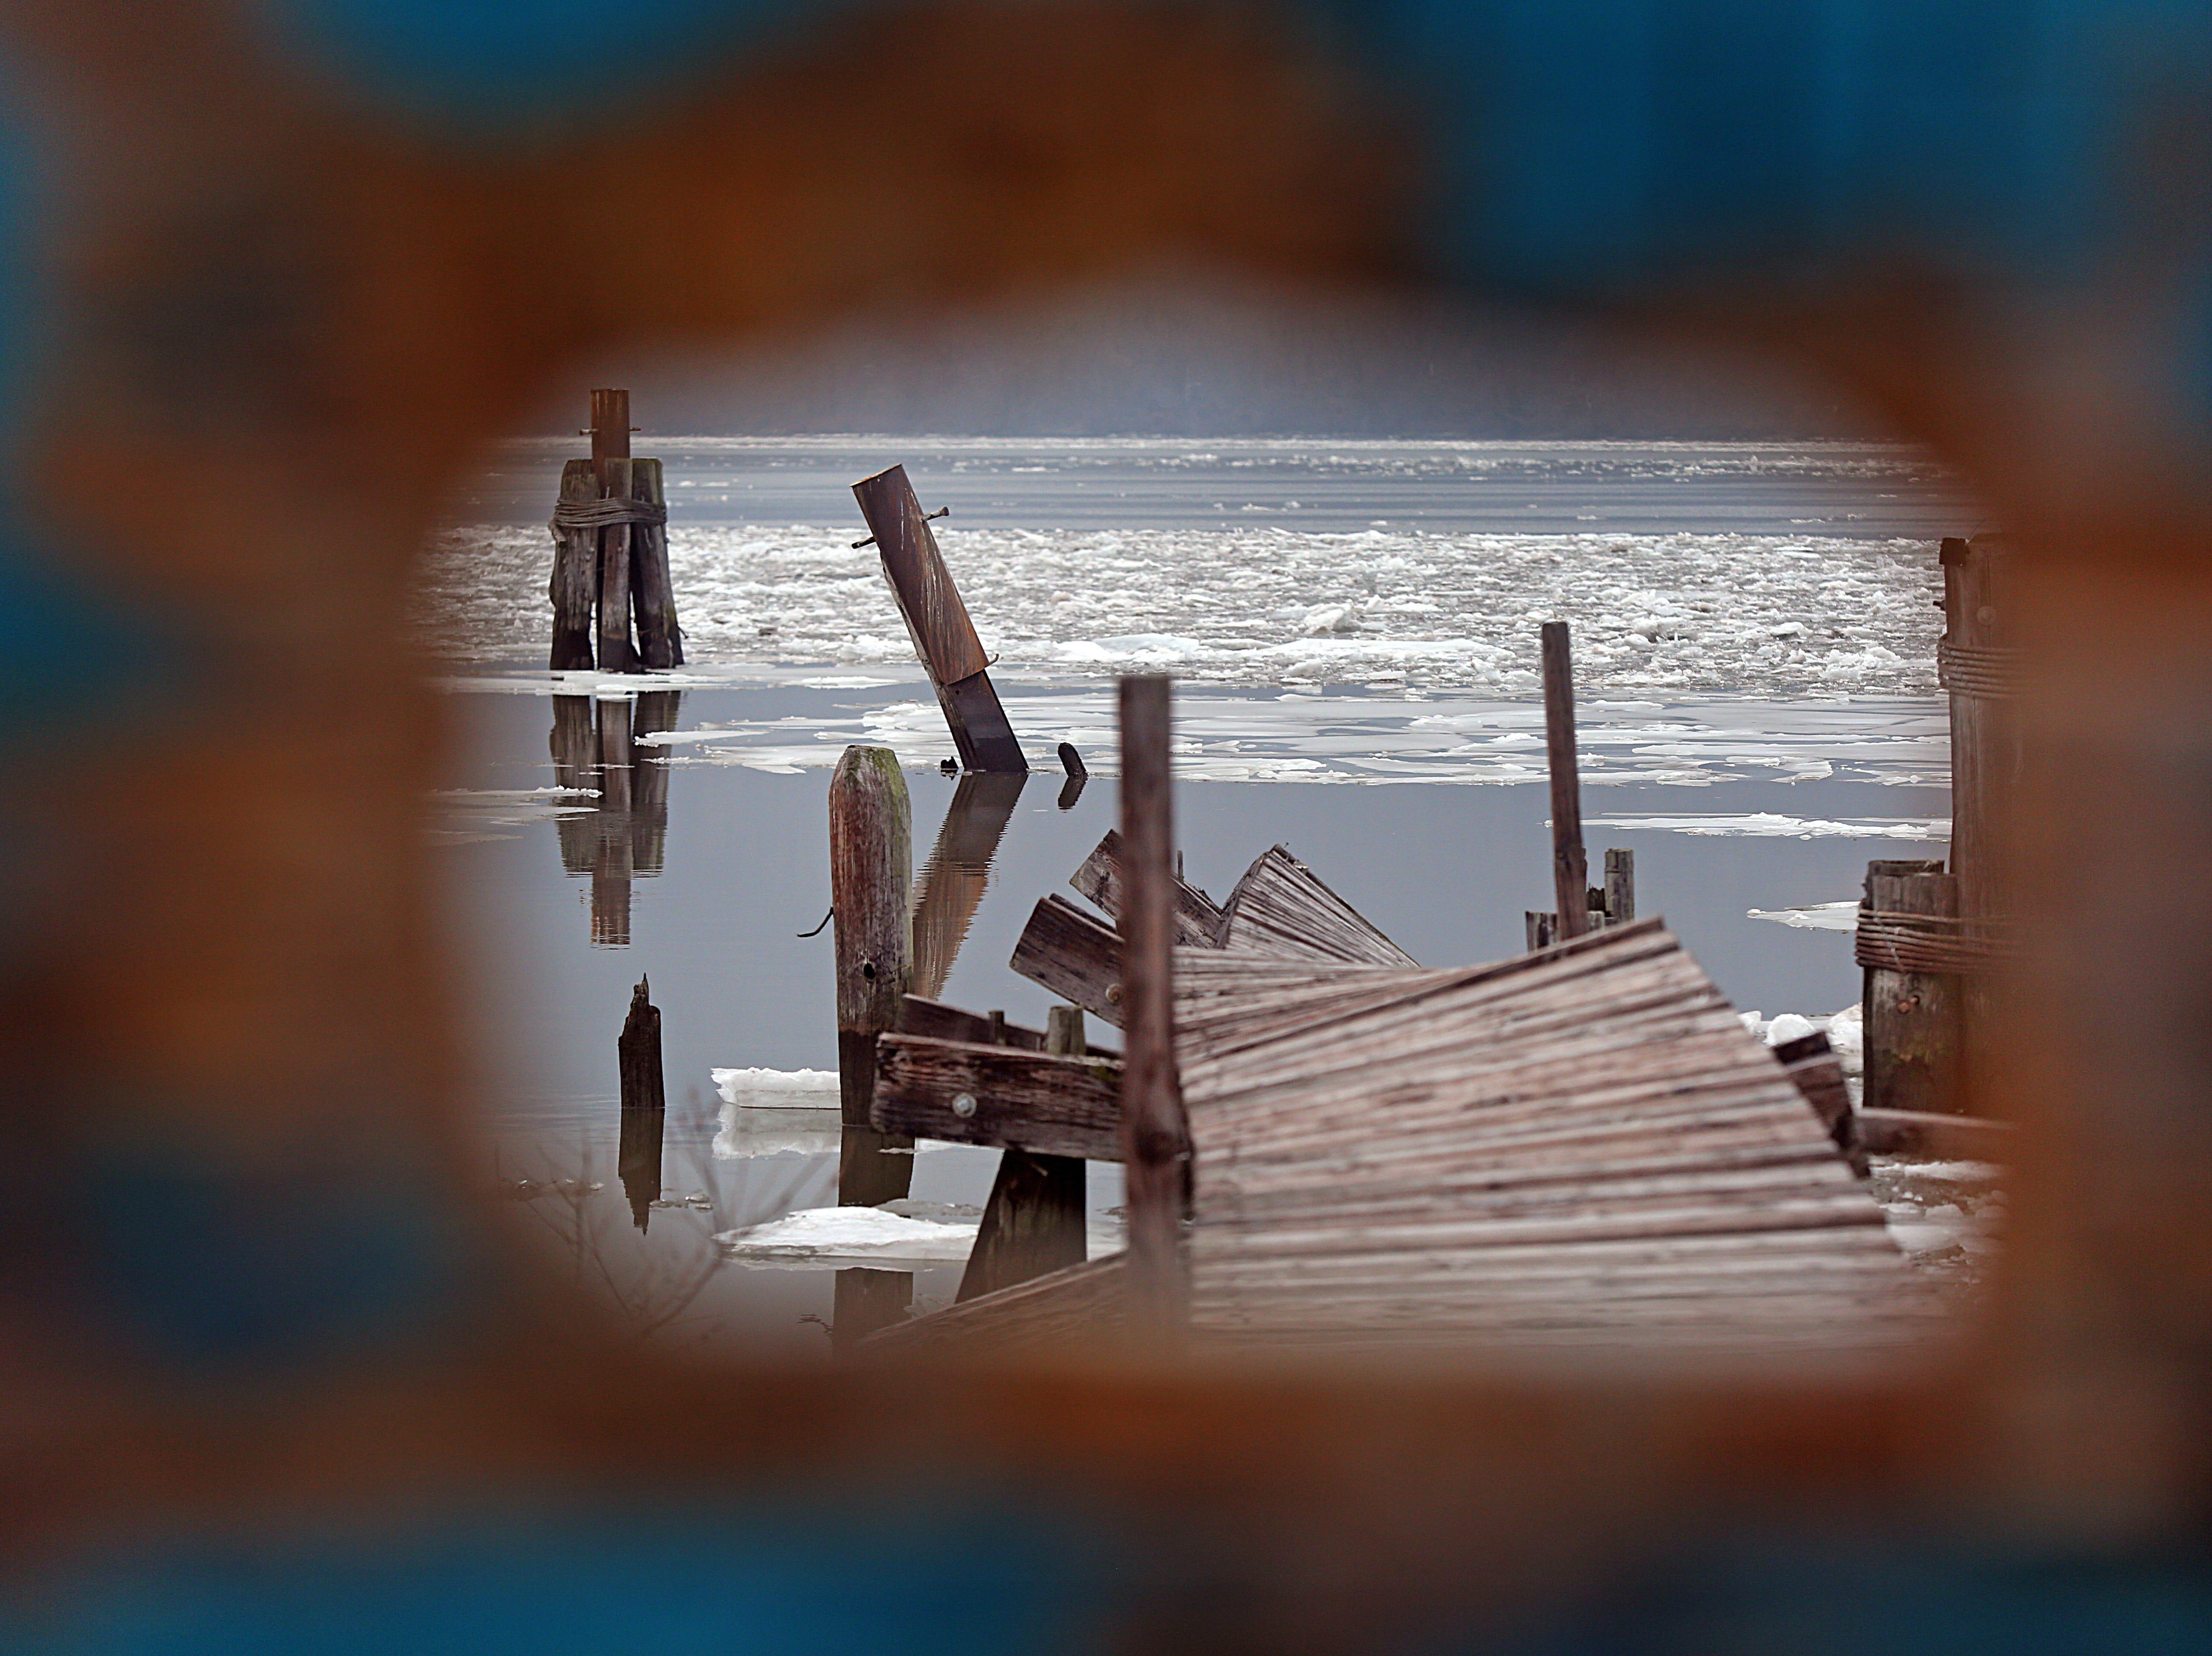 The view of the Hudson River from Fleischmann Pier in Peekskill Jan. 22, 2018.